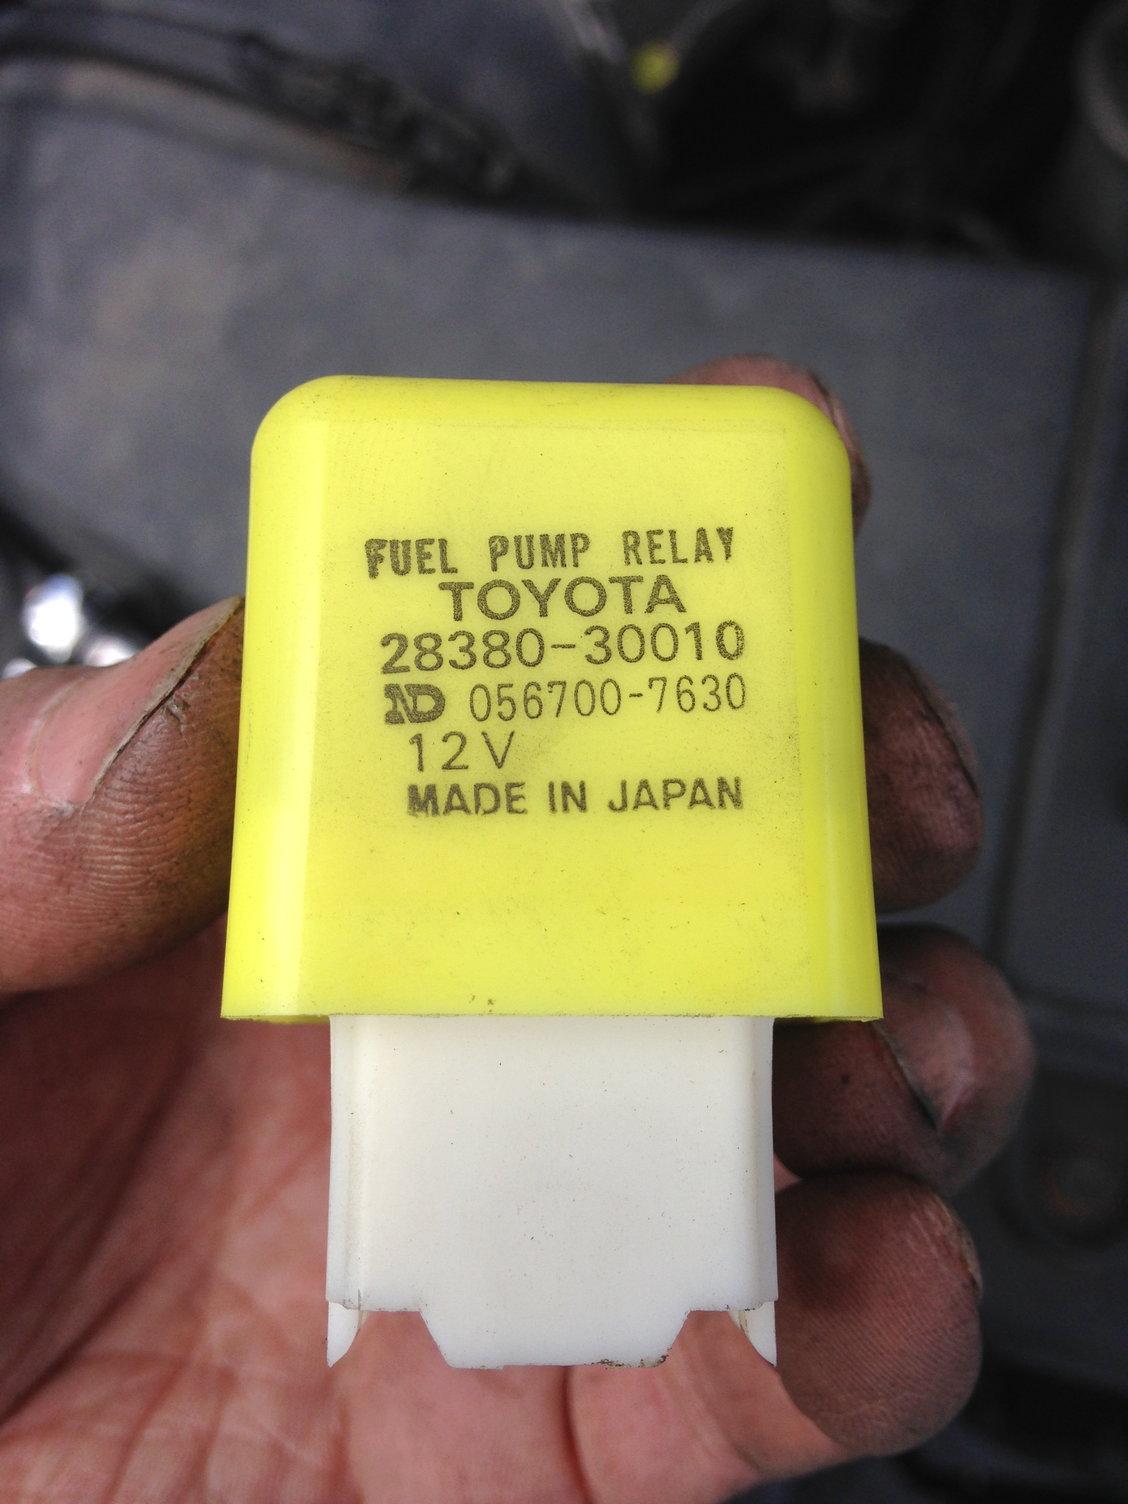 91 LS400 Fuel Pump Resistor - ClubLexus - Lexus Forum Discussion